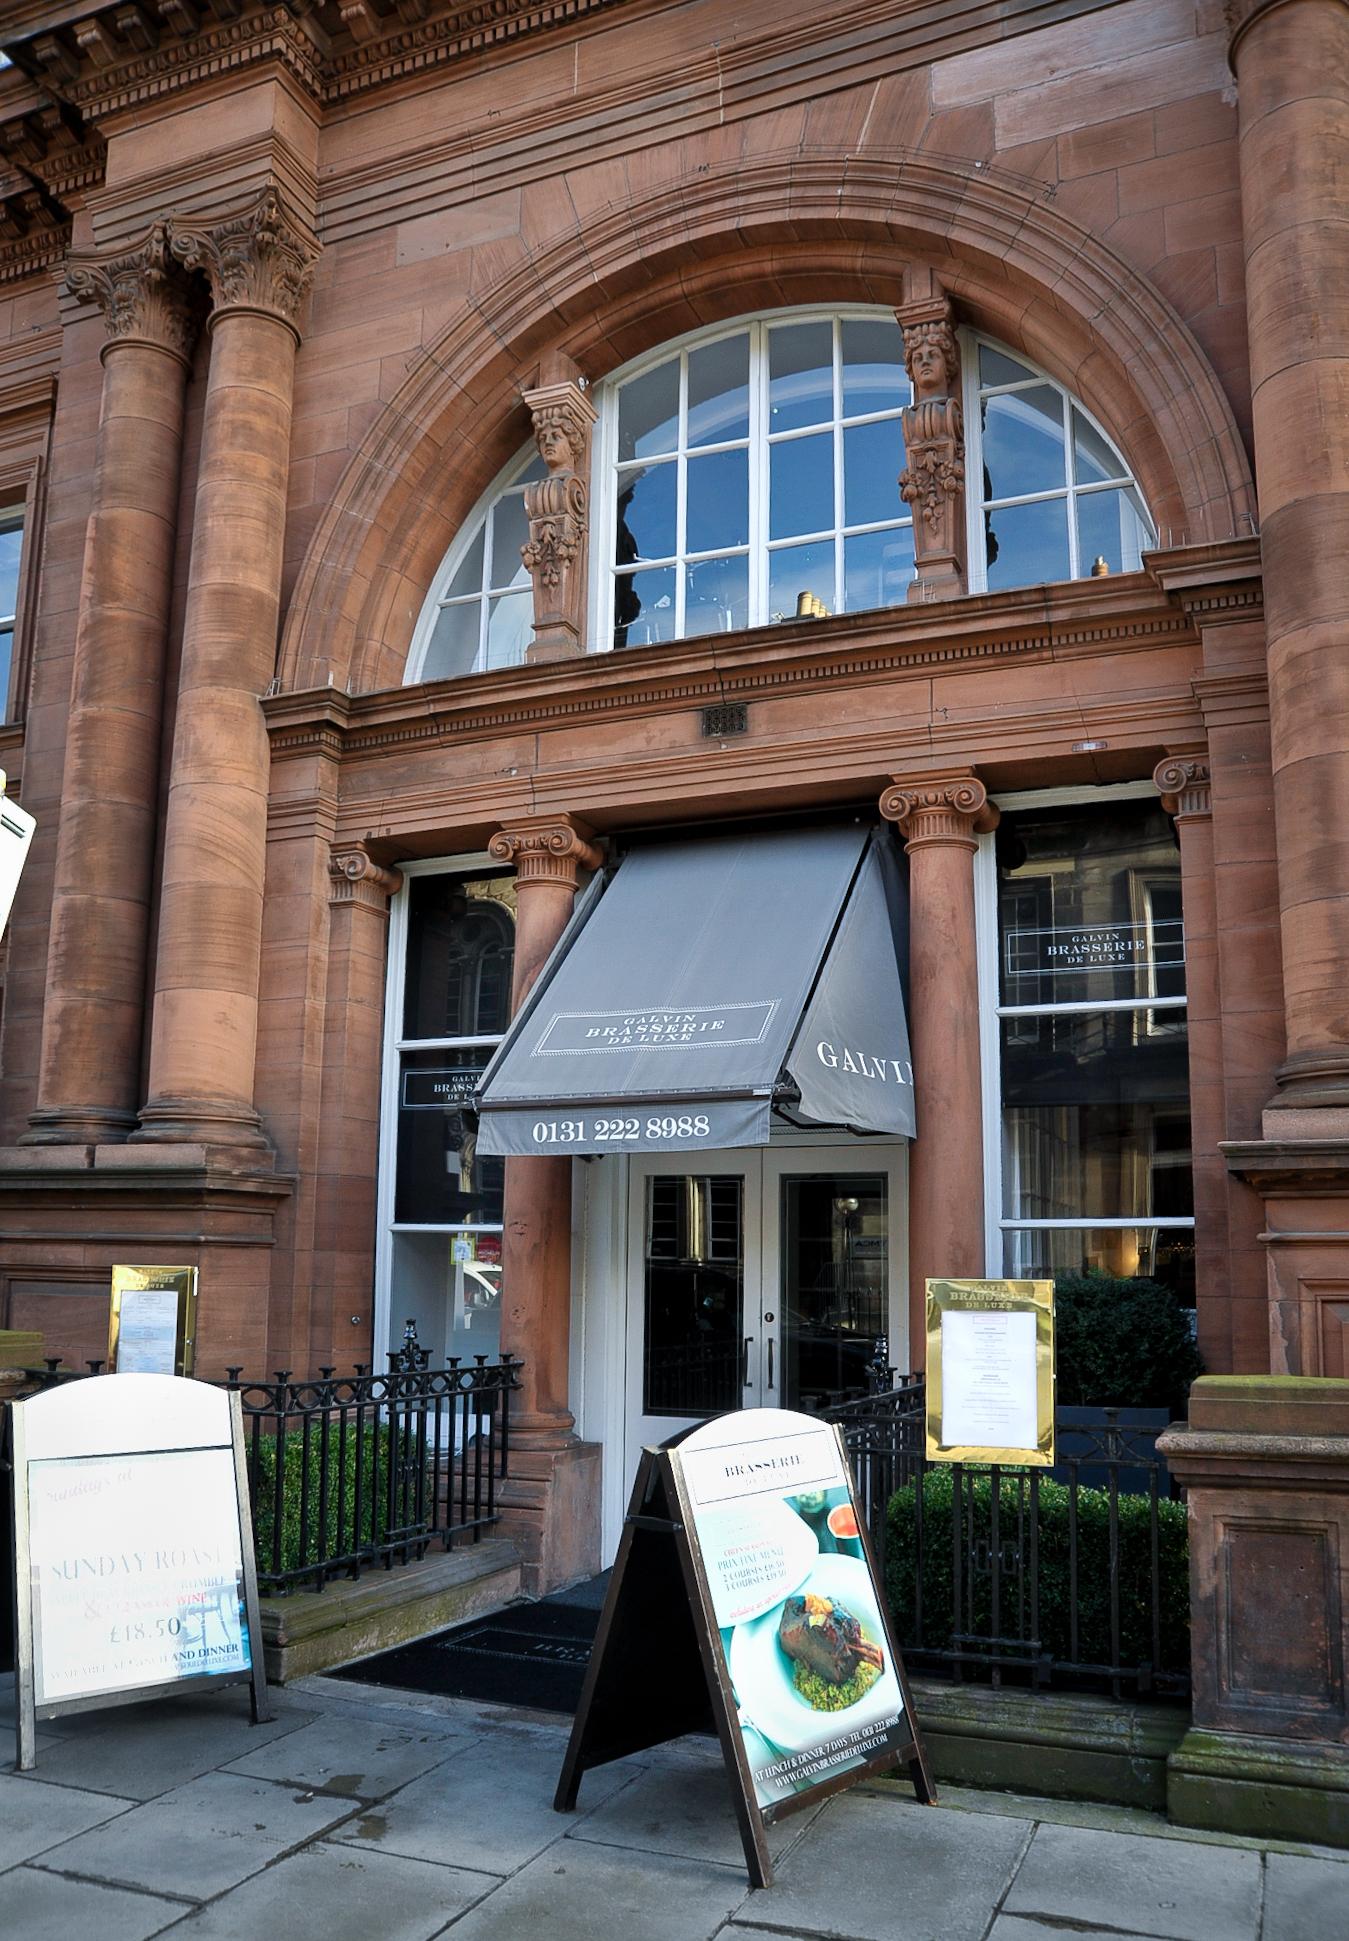 Galvin Brasserie de Luxe, Restaurants, Edinburgh